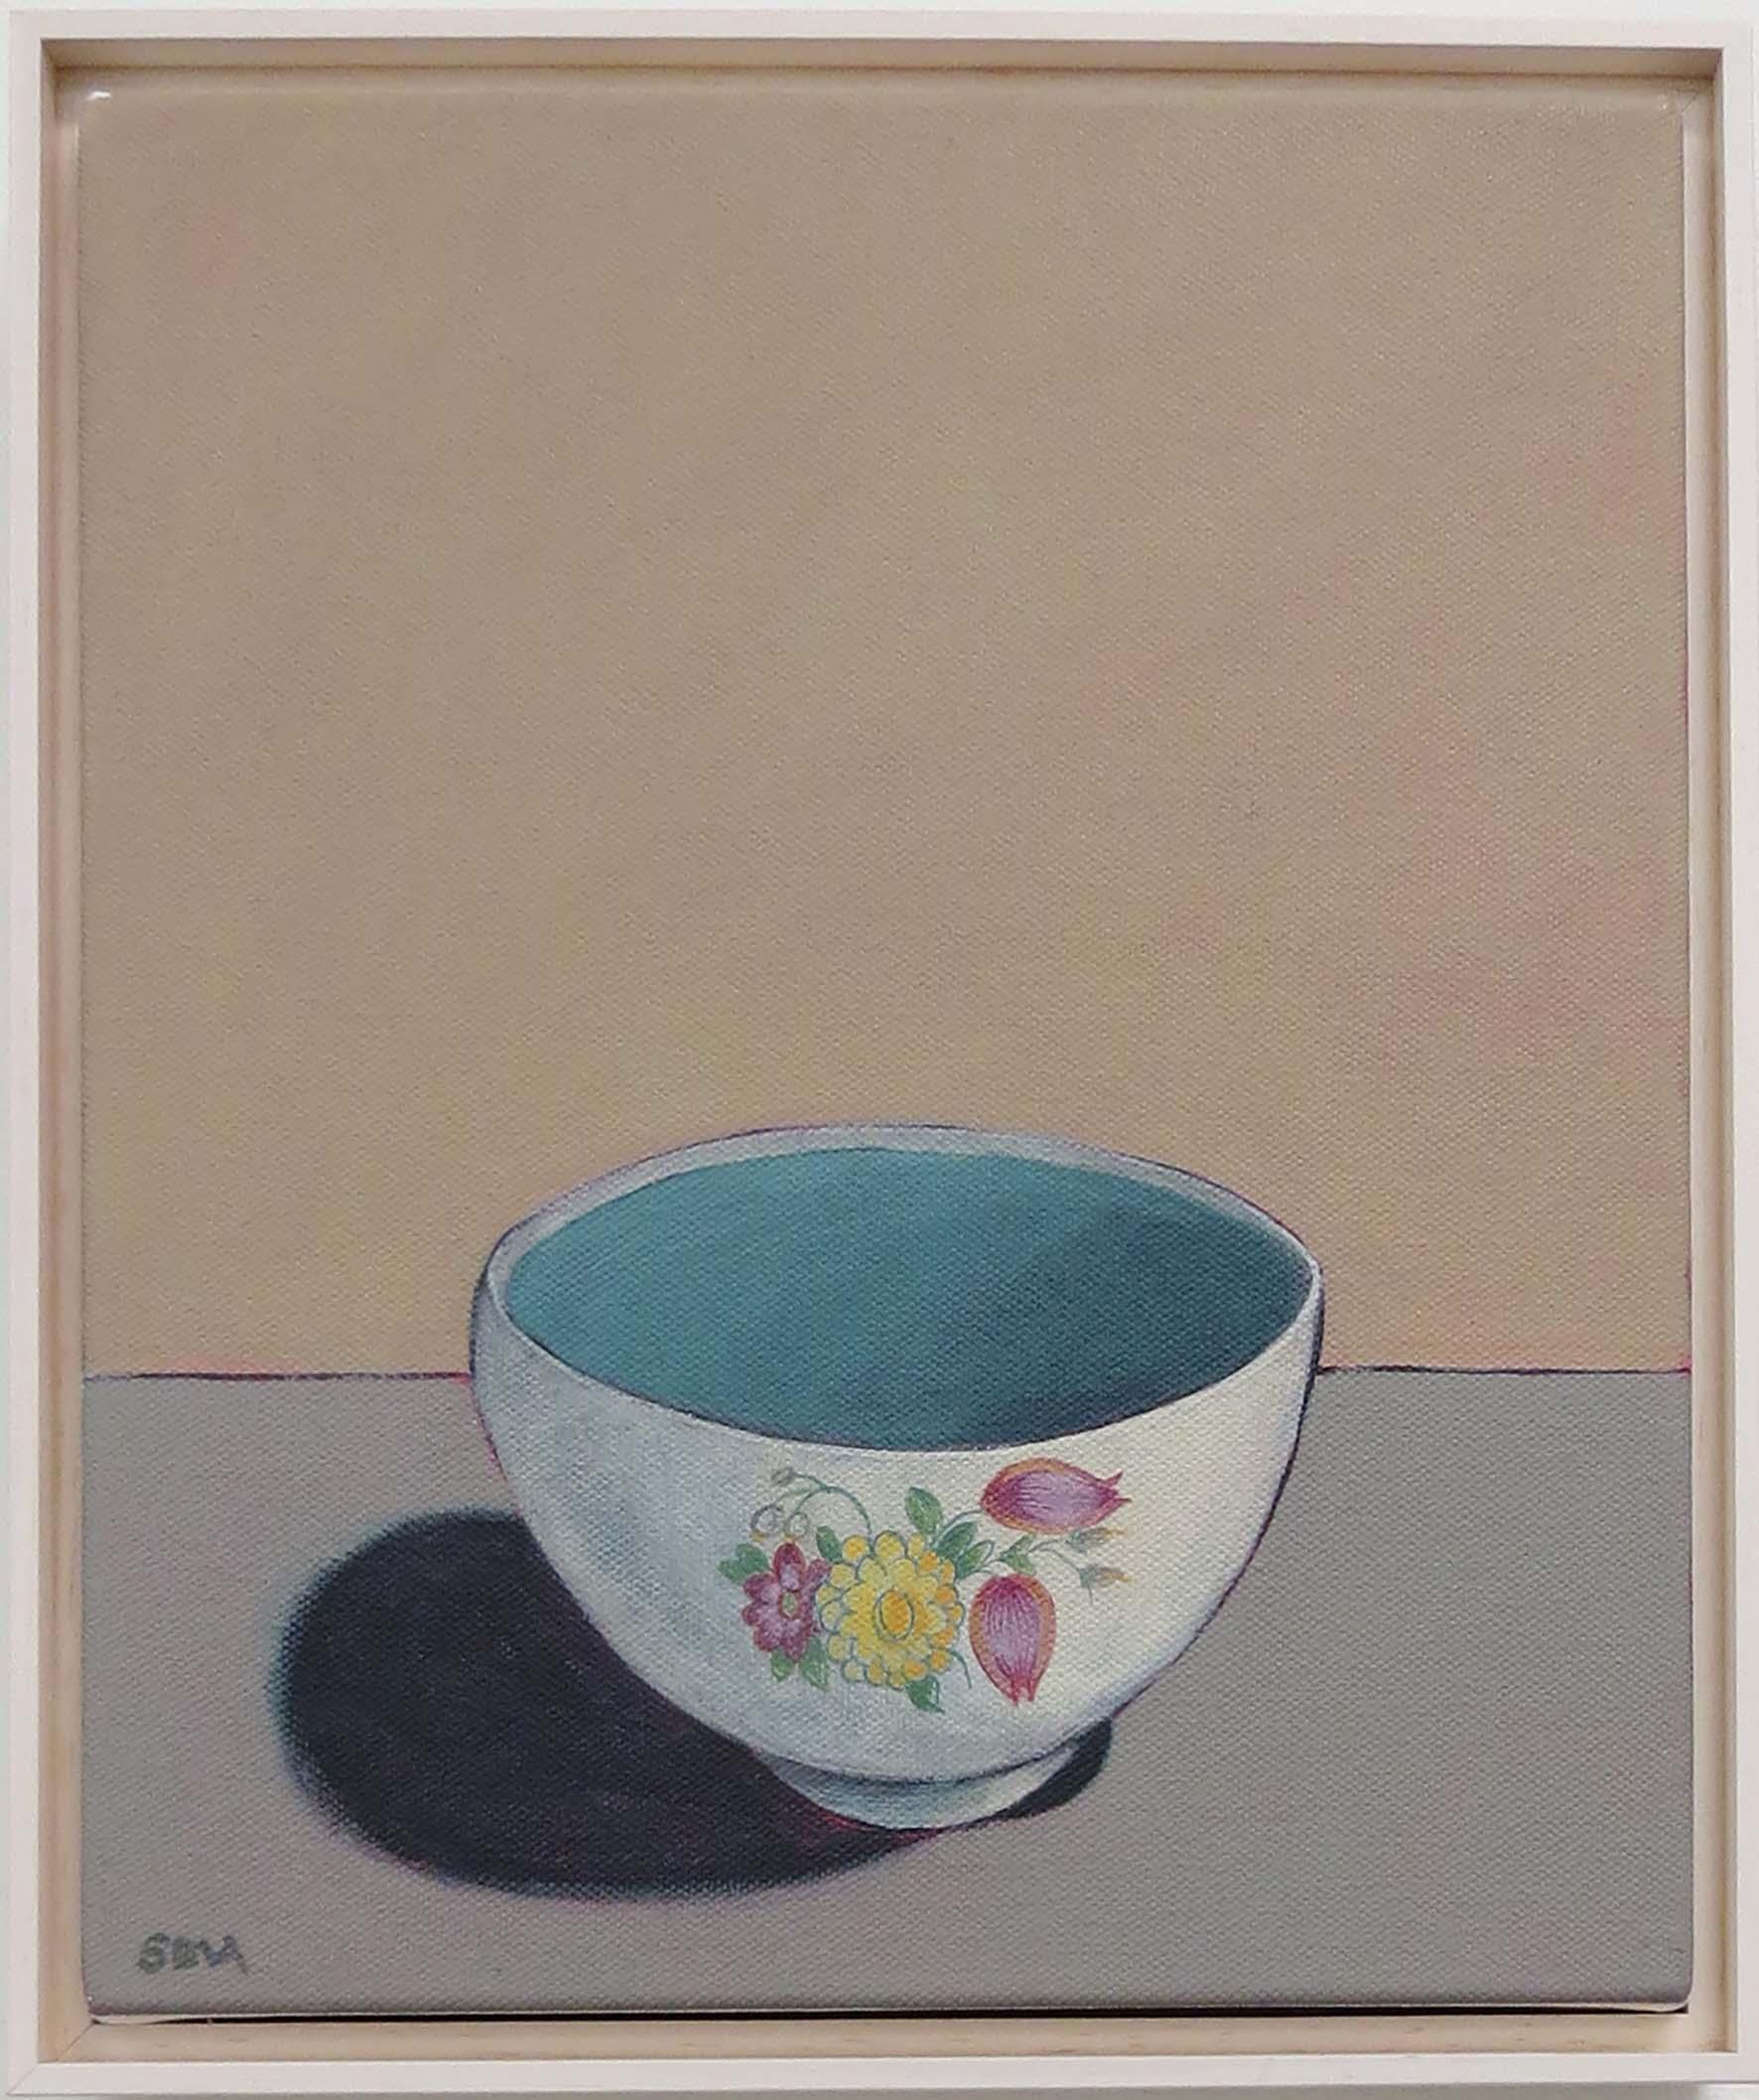 8. Sue Eva, 'Susie Cooper', 2018, Acrylic on canvas, 30 x 25cm, $345